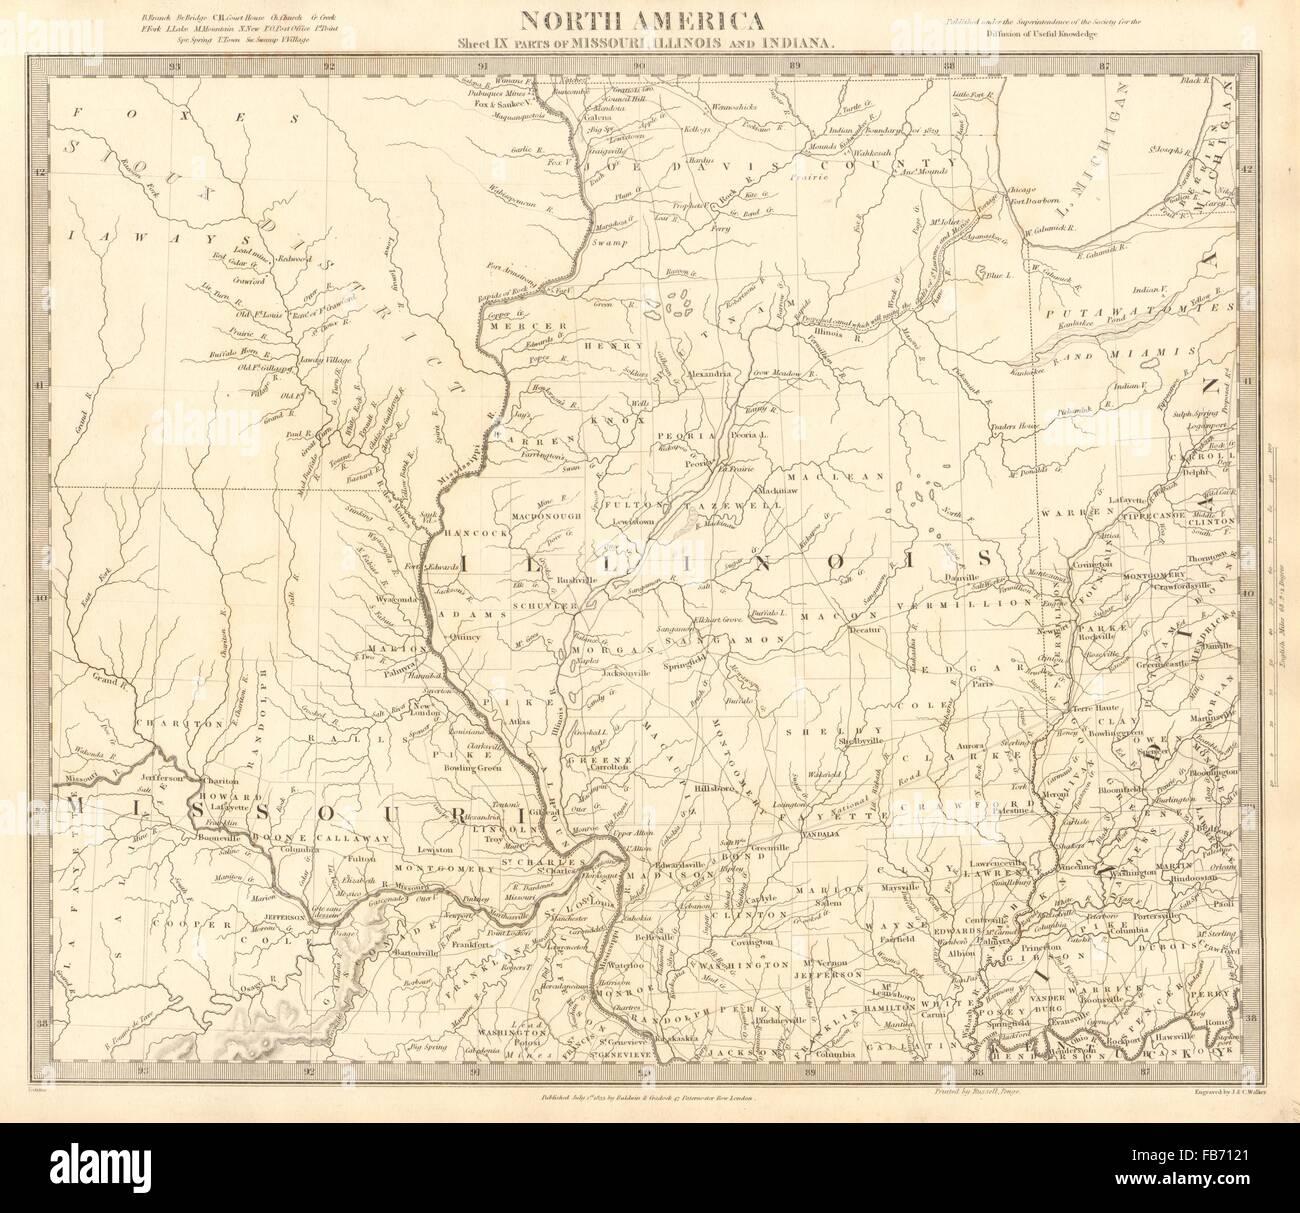 USA Missouri Illinois Indiana Indian tribes villages borders